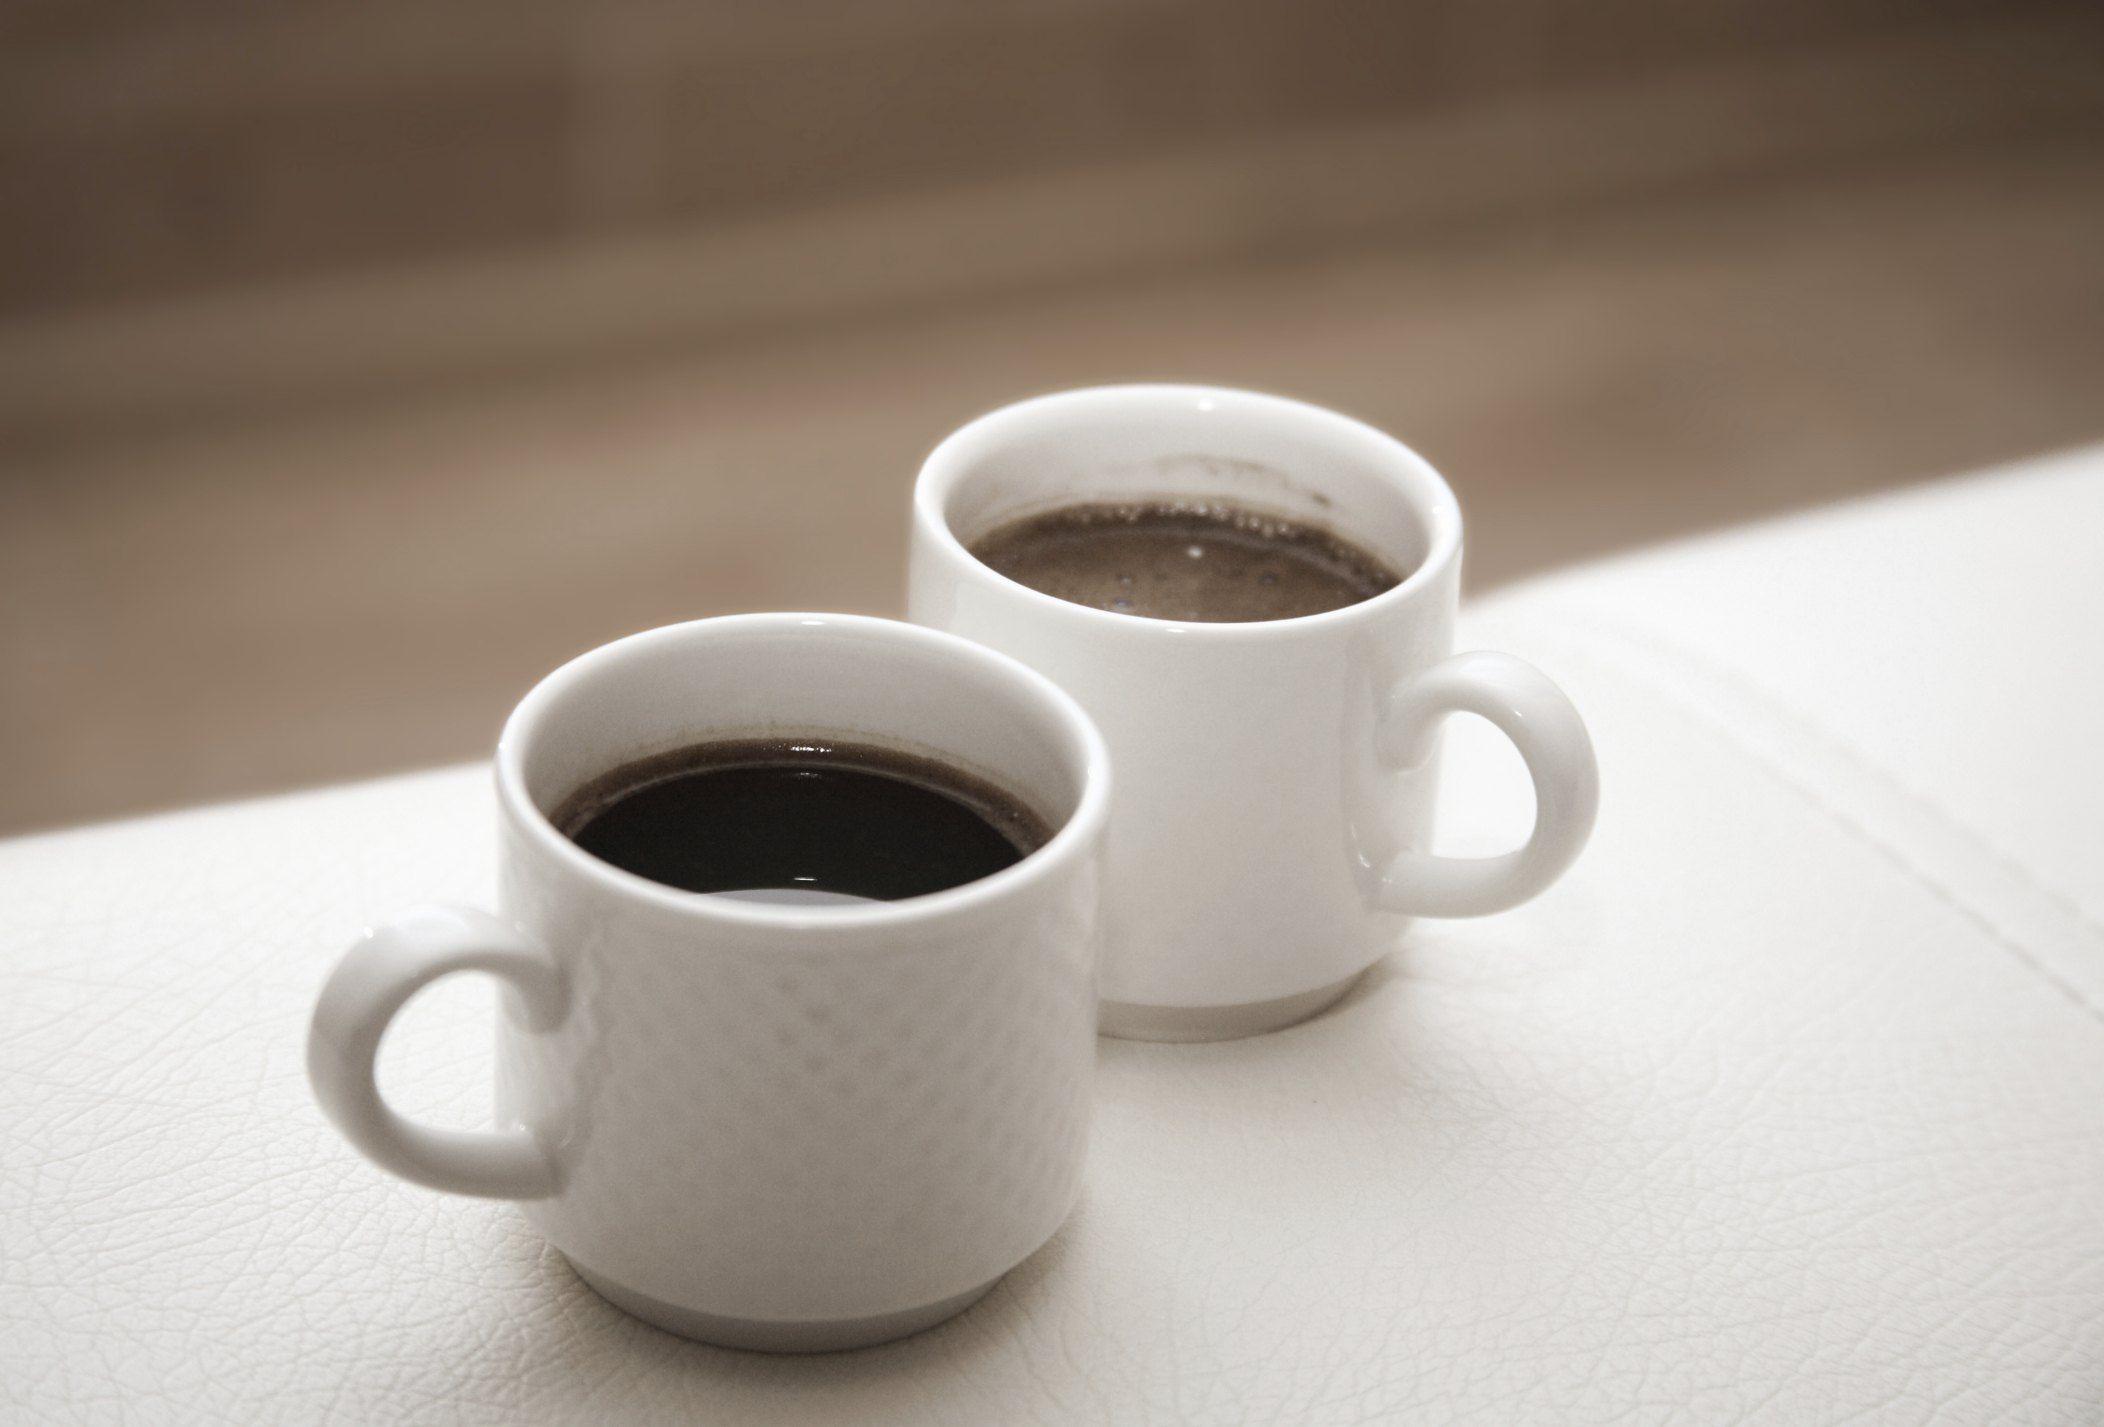 Does Caffeine Increase Your Metabolism? | Livestrong.com